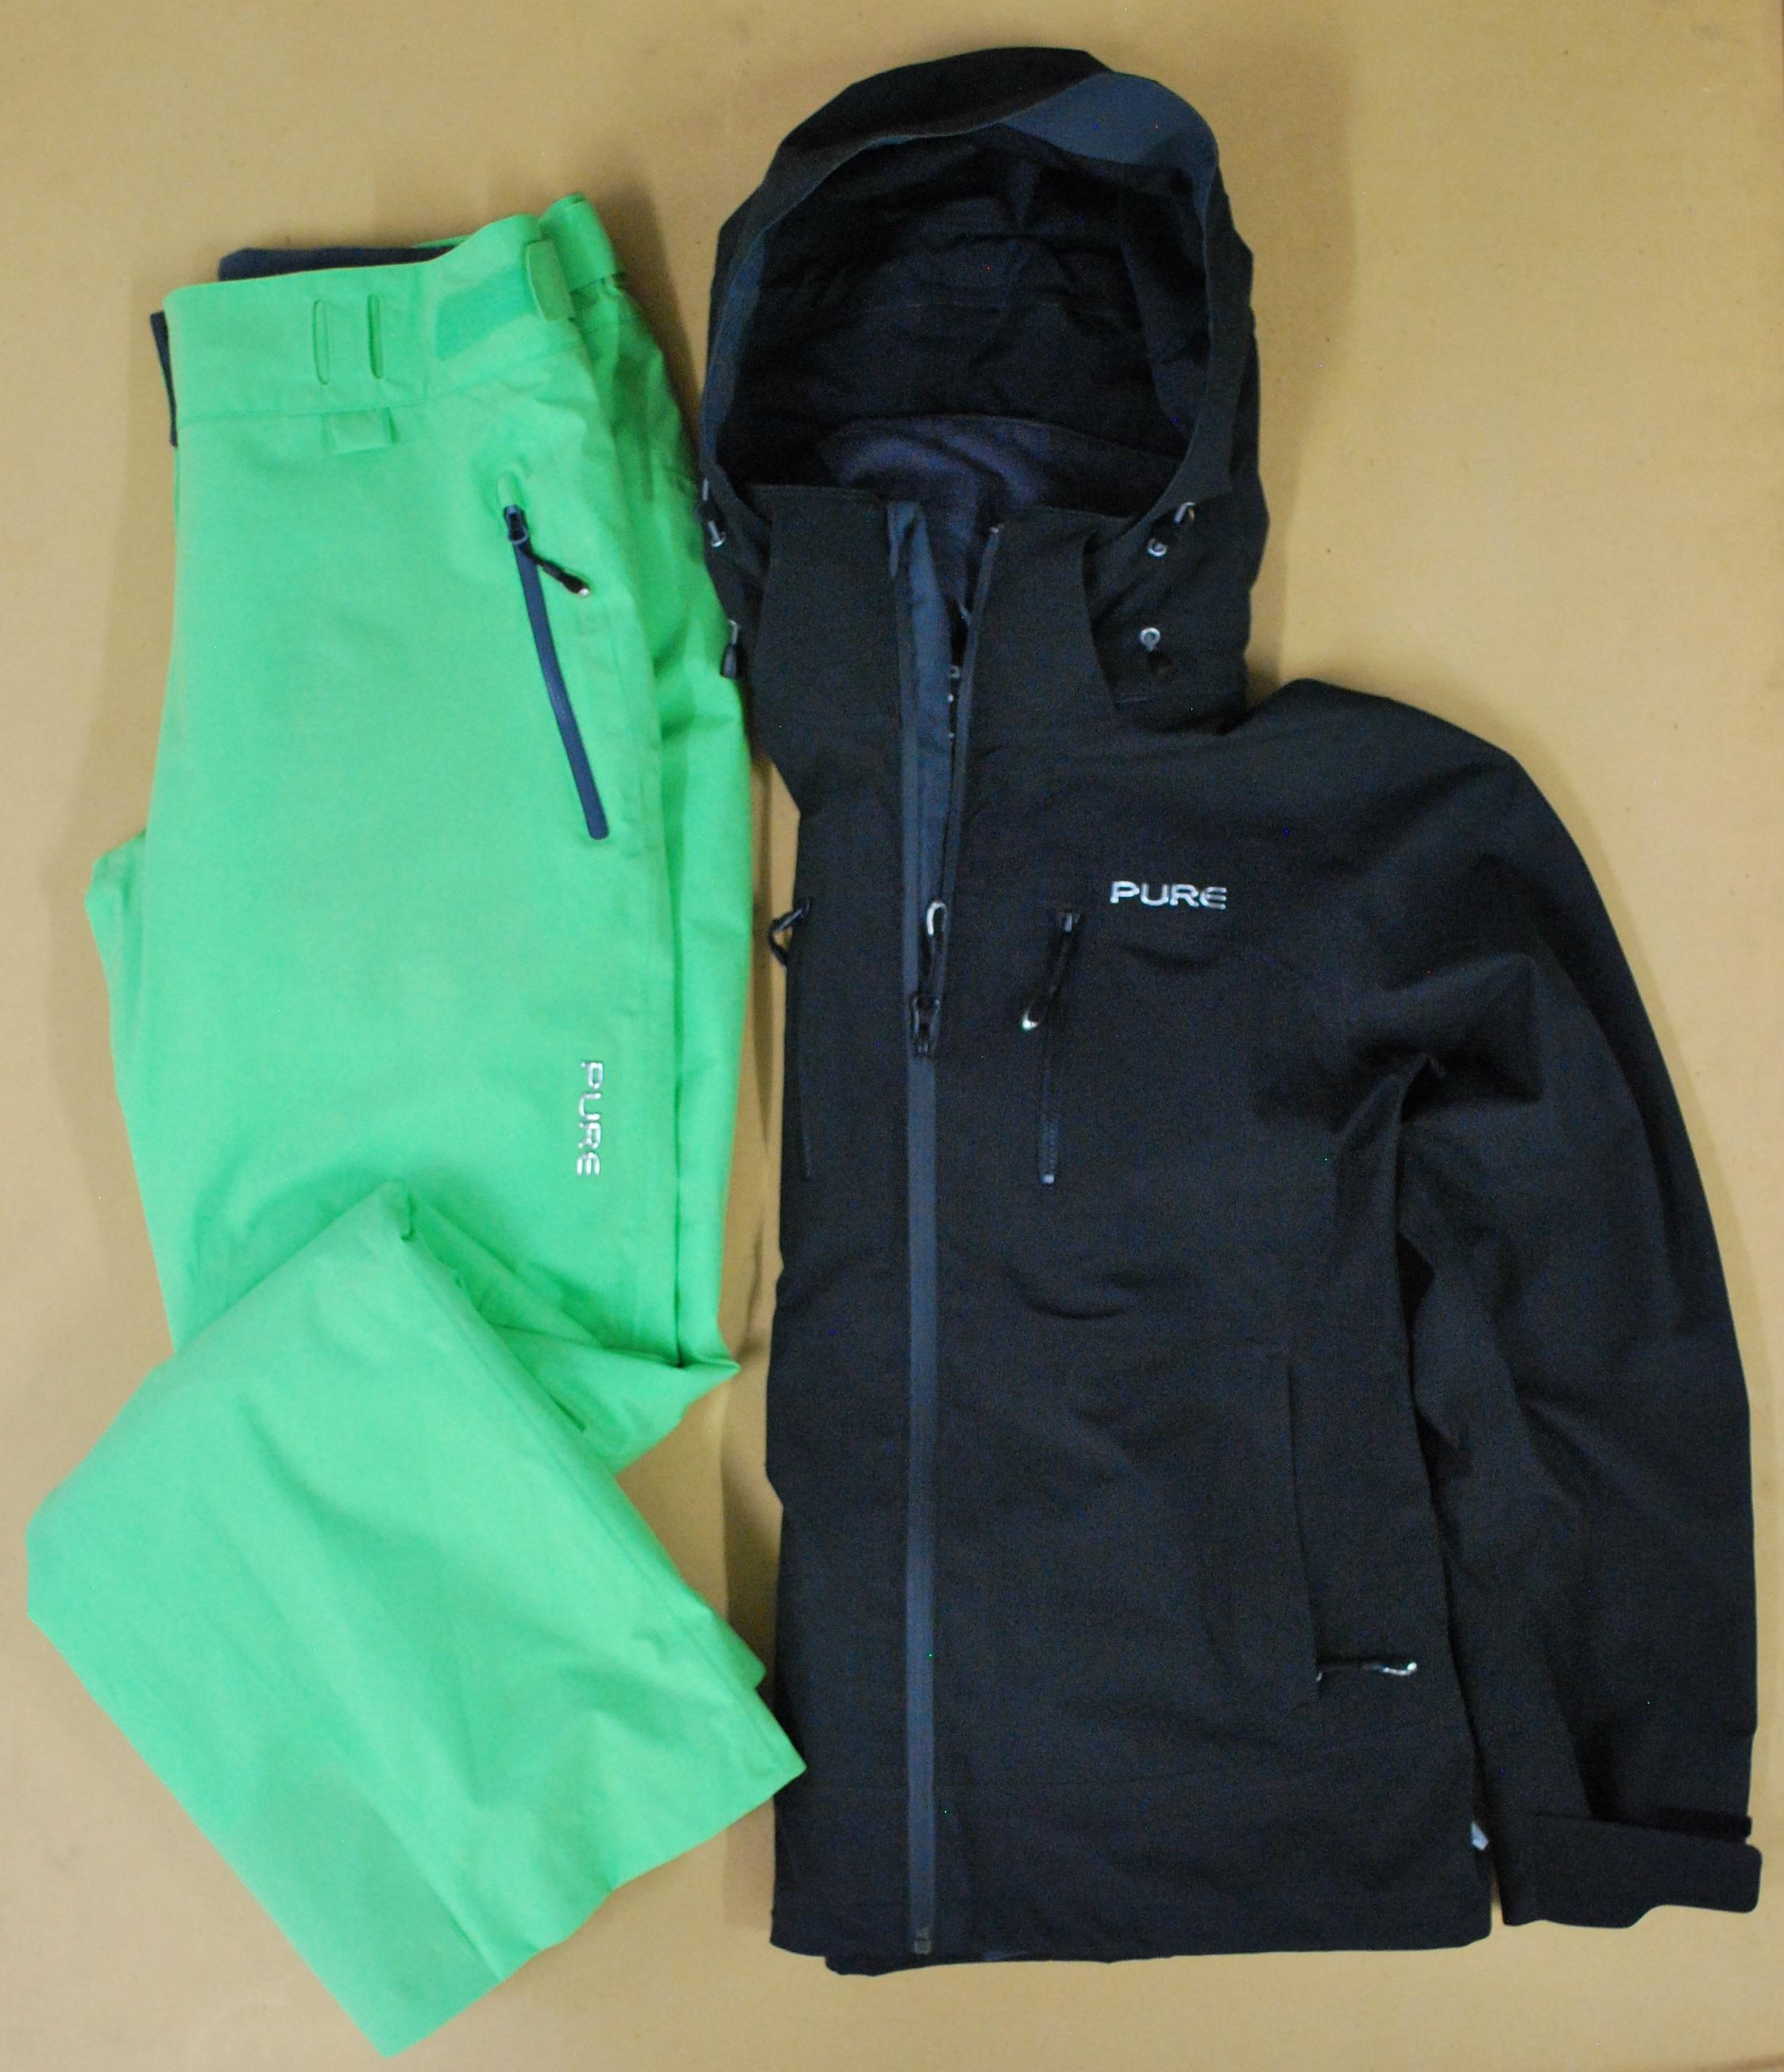 Pure Brandz black jacket & green pant